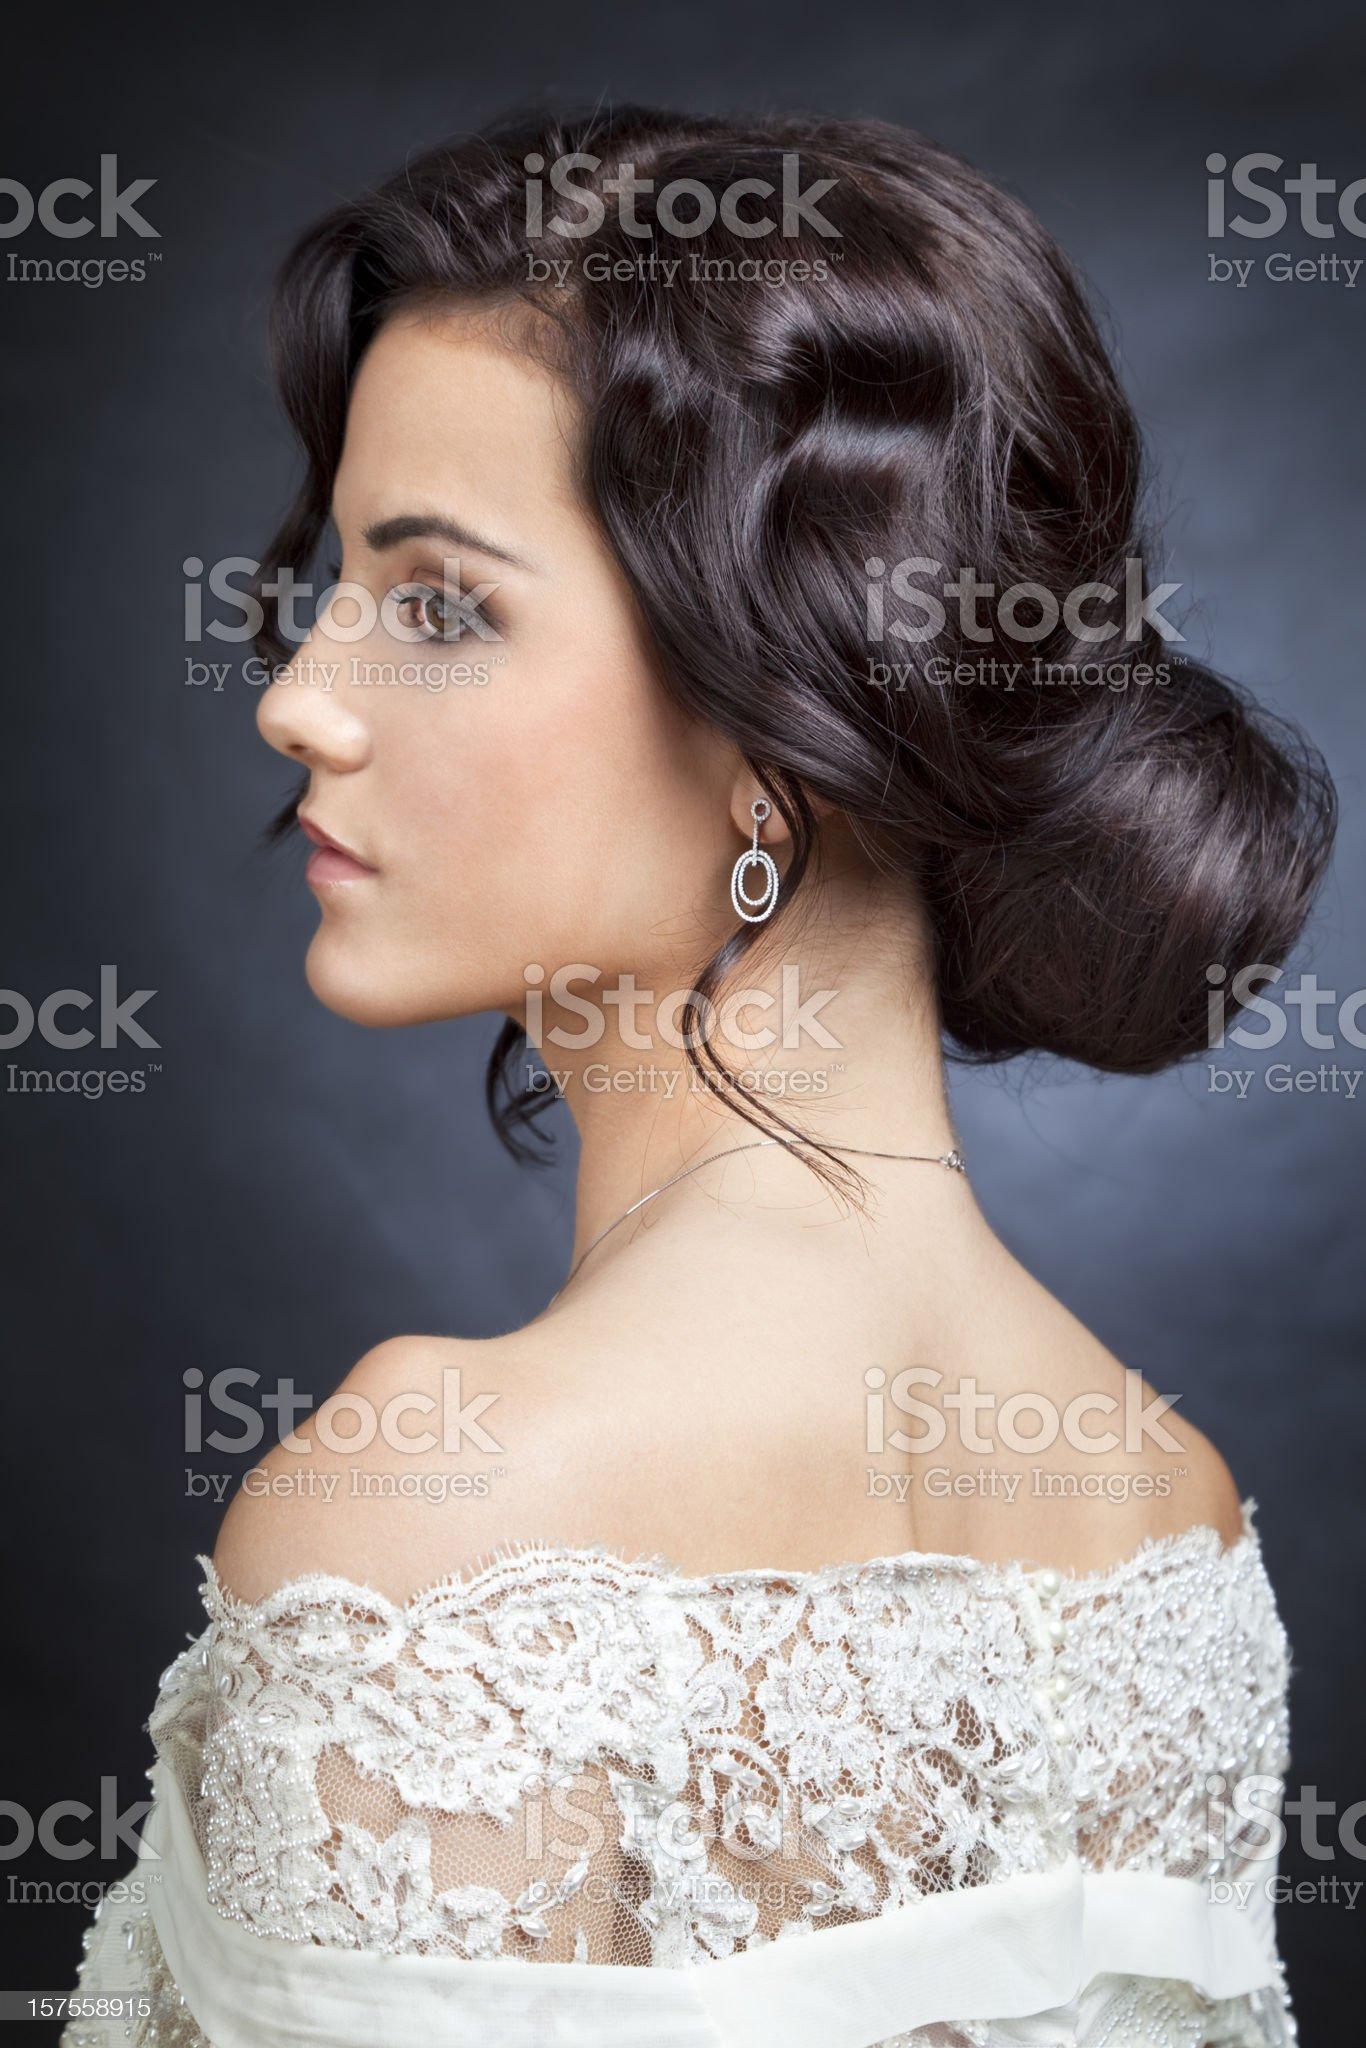 Bride with bun royalty-free stock photo